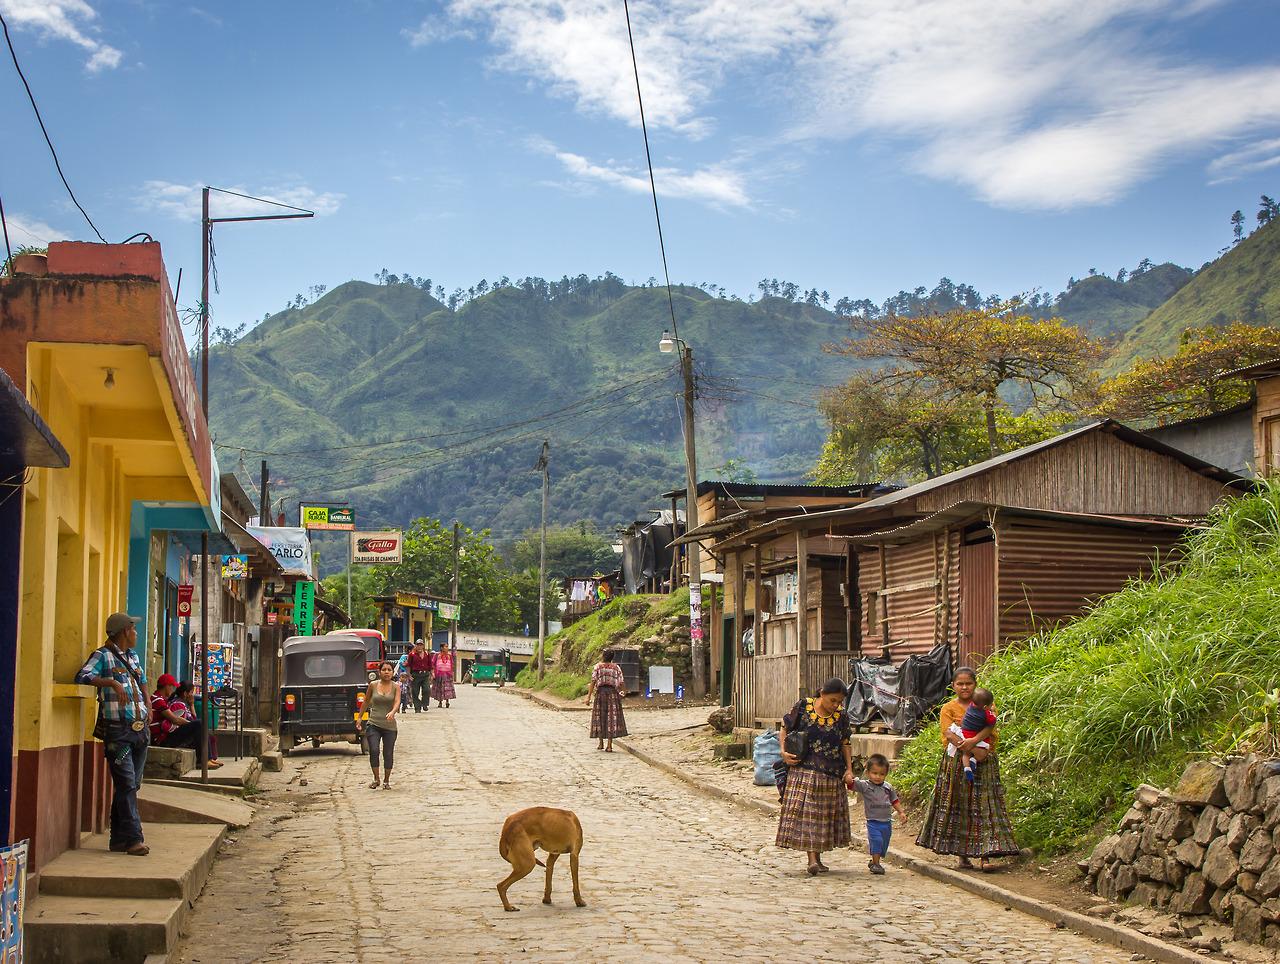 Life in Lanquin, Guatemala